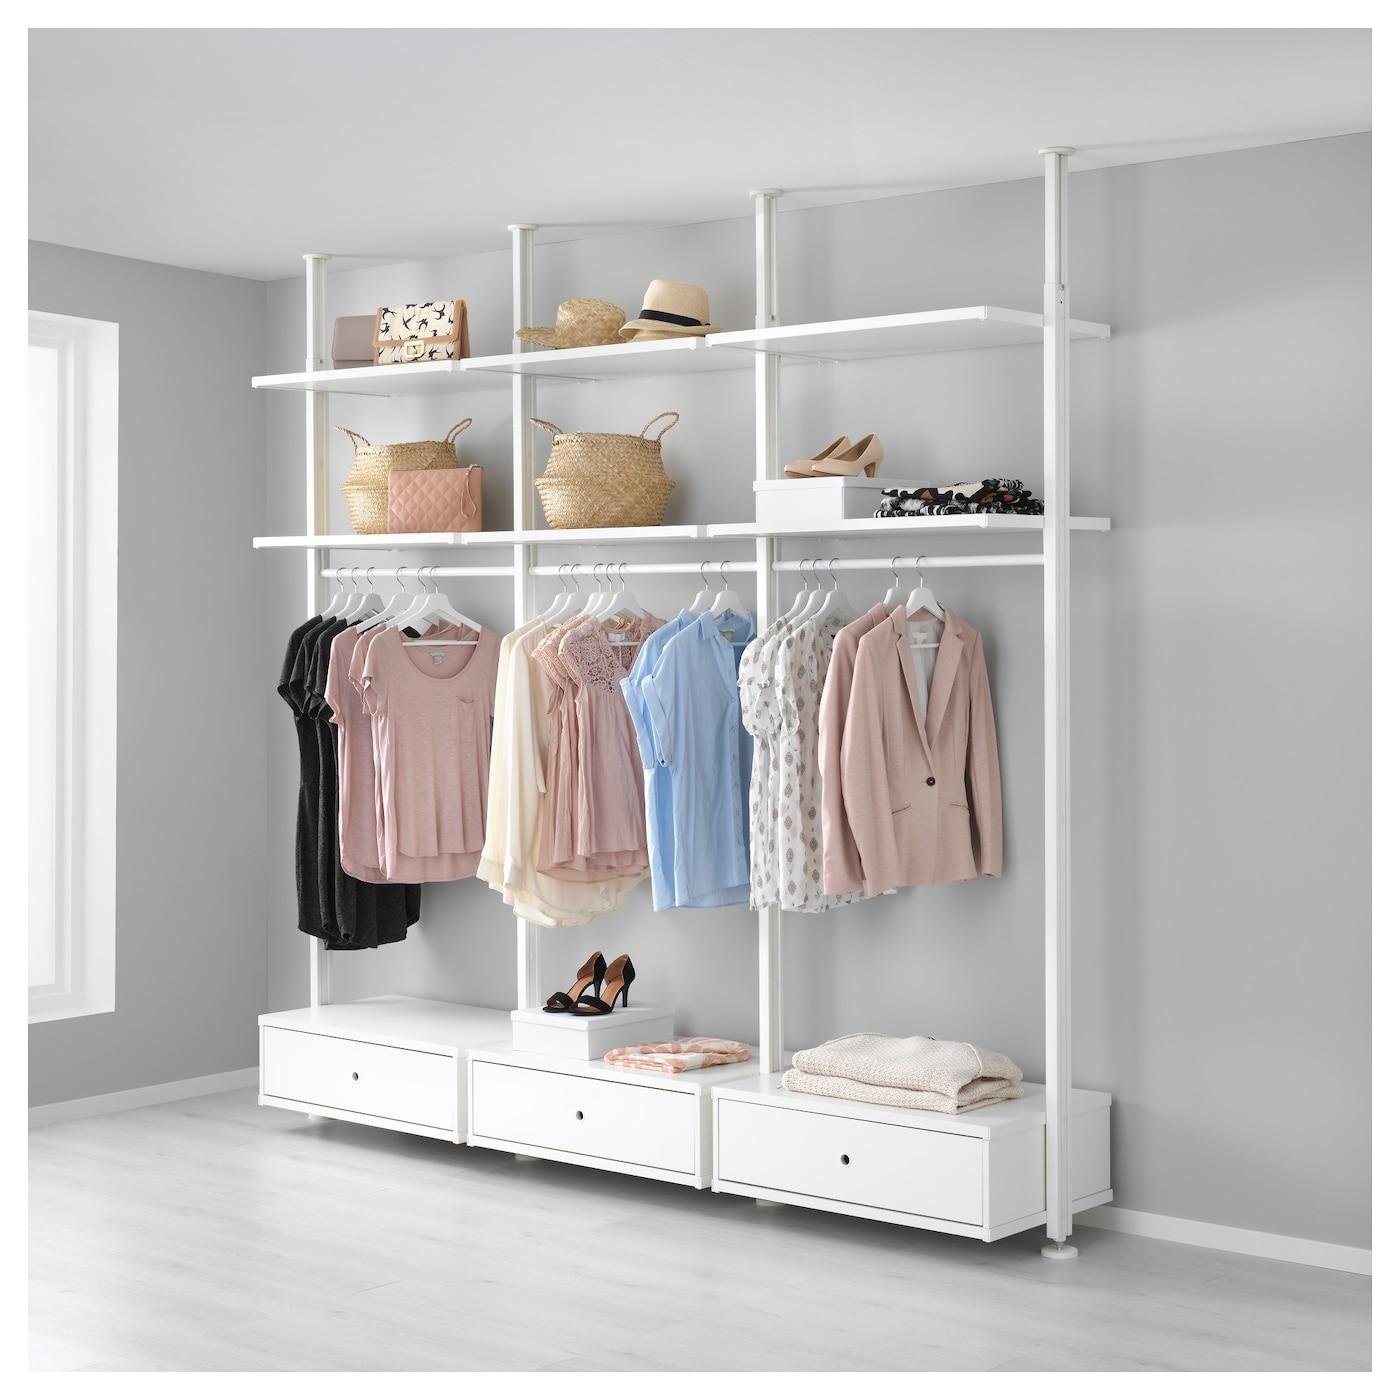 elvarli 3 sections white 258x51x222 350 cm ikea. Black Bedroom Furniture Sets. Home Design Ideas